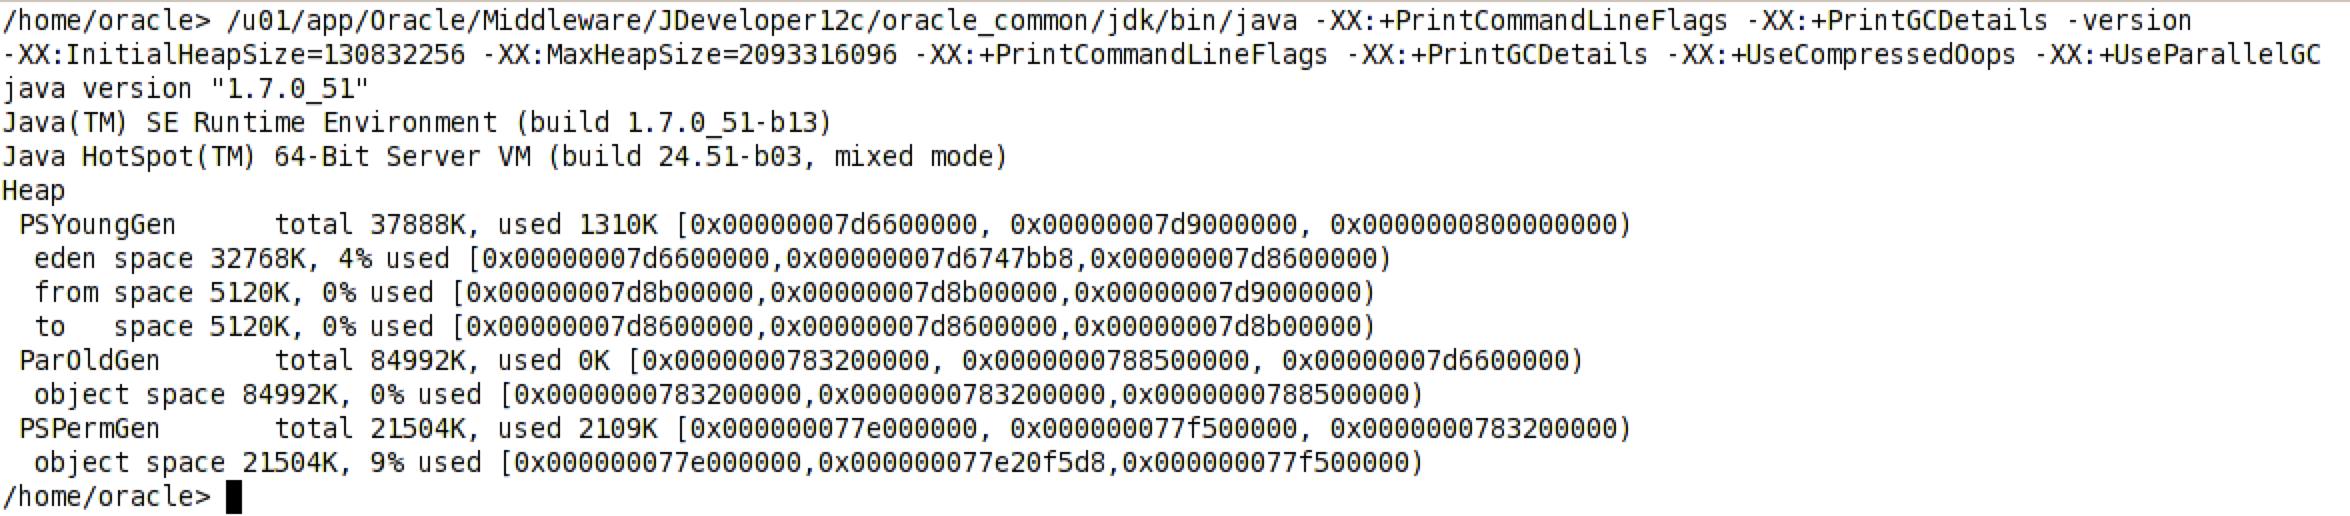 WebLogic JVM Setup Problems and how to address them · Sysco